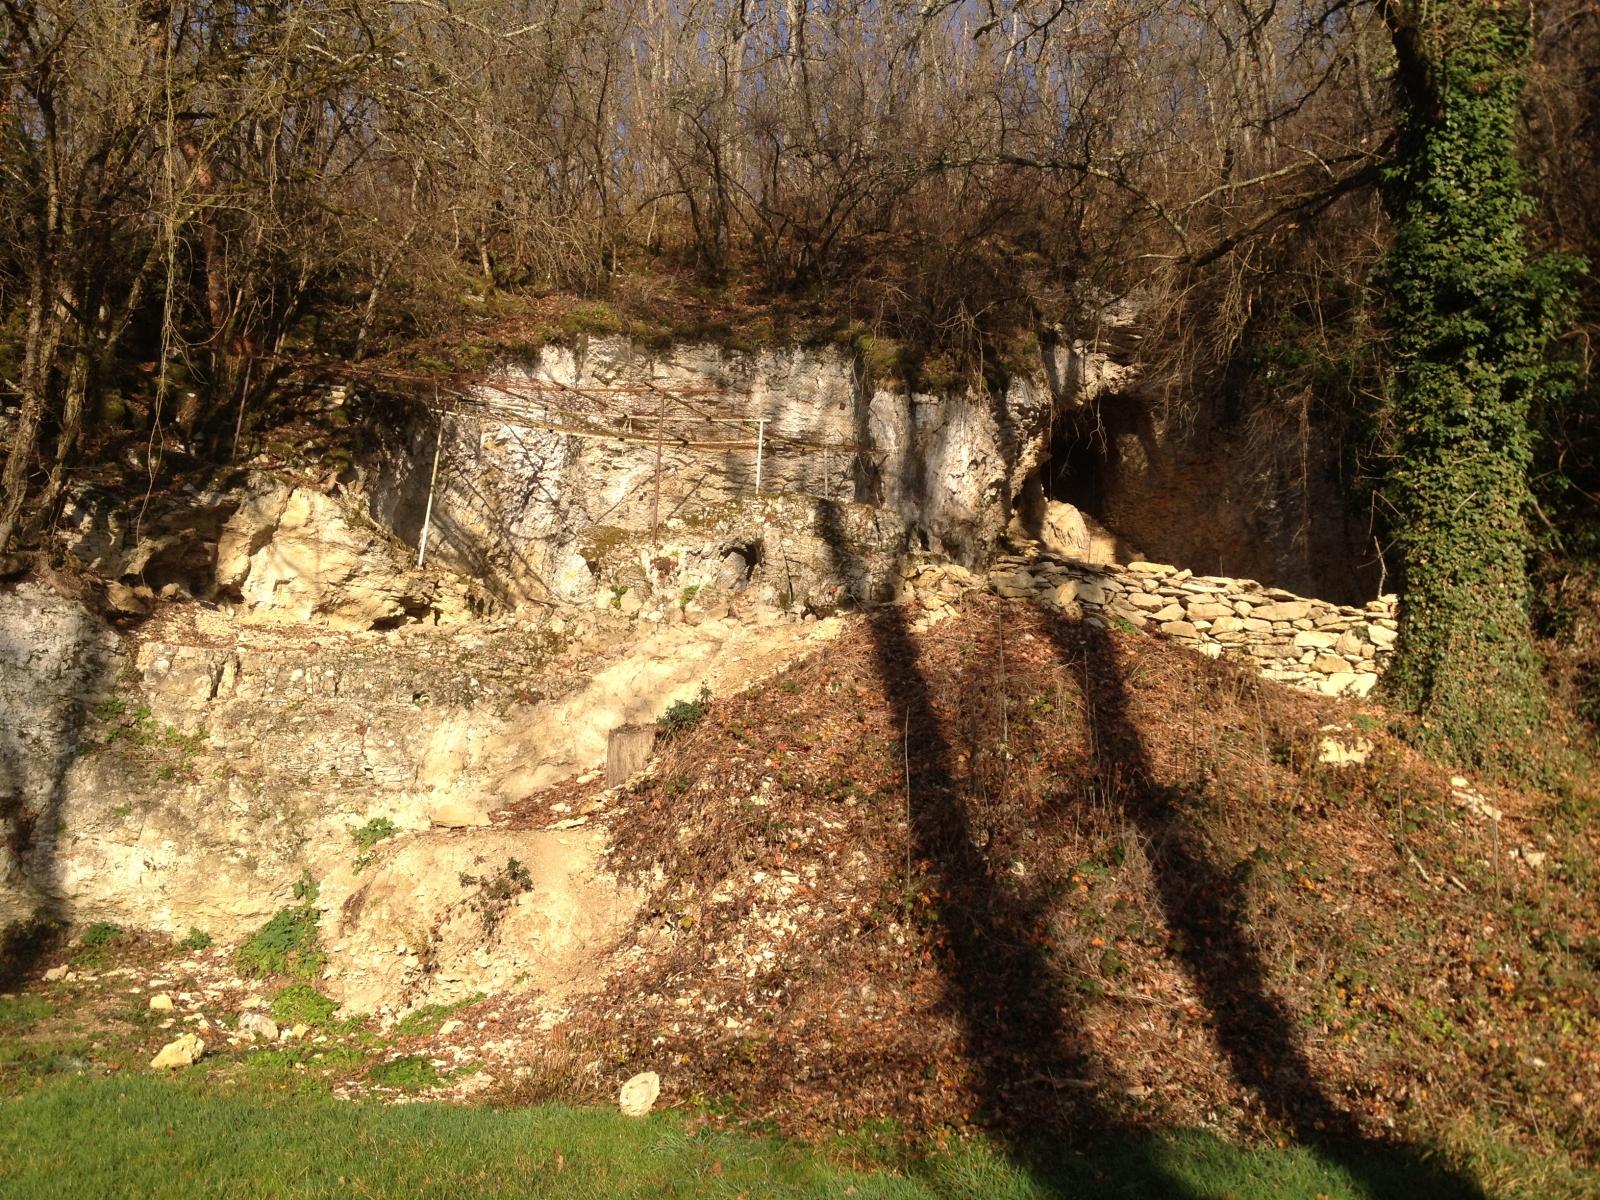 Grotte du Renne neanderthal